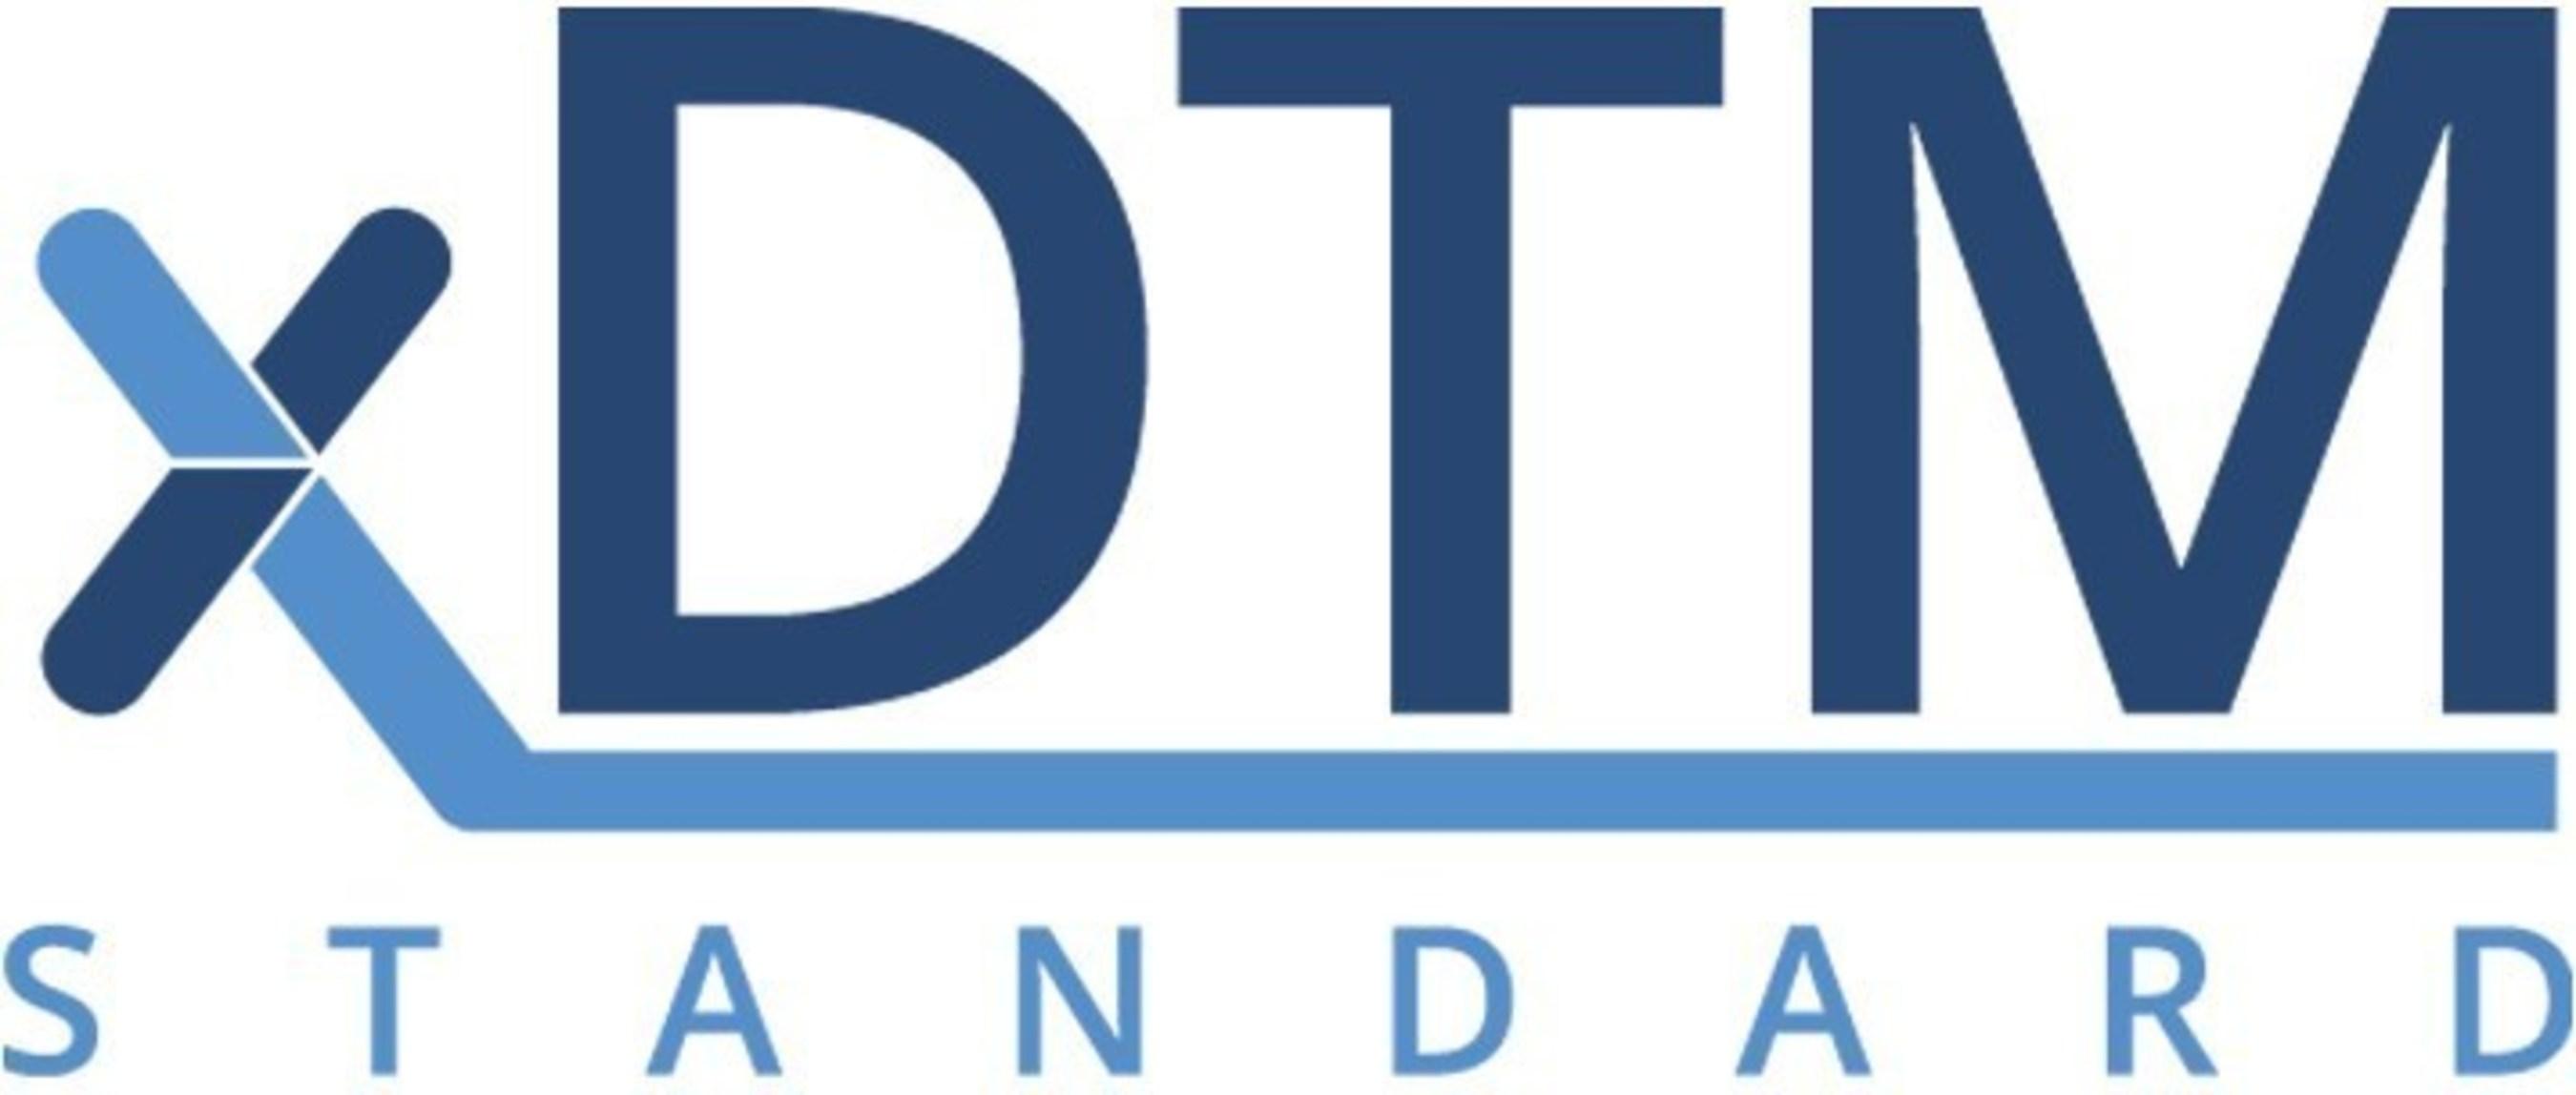 300+ Organizations Endorse xDTM Digital Transaction Management Standard